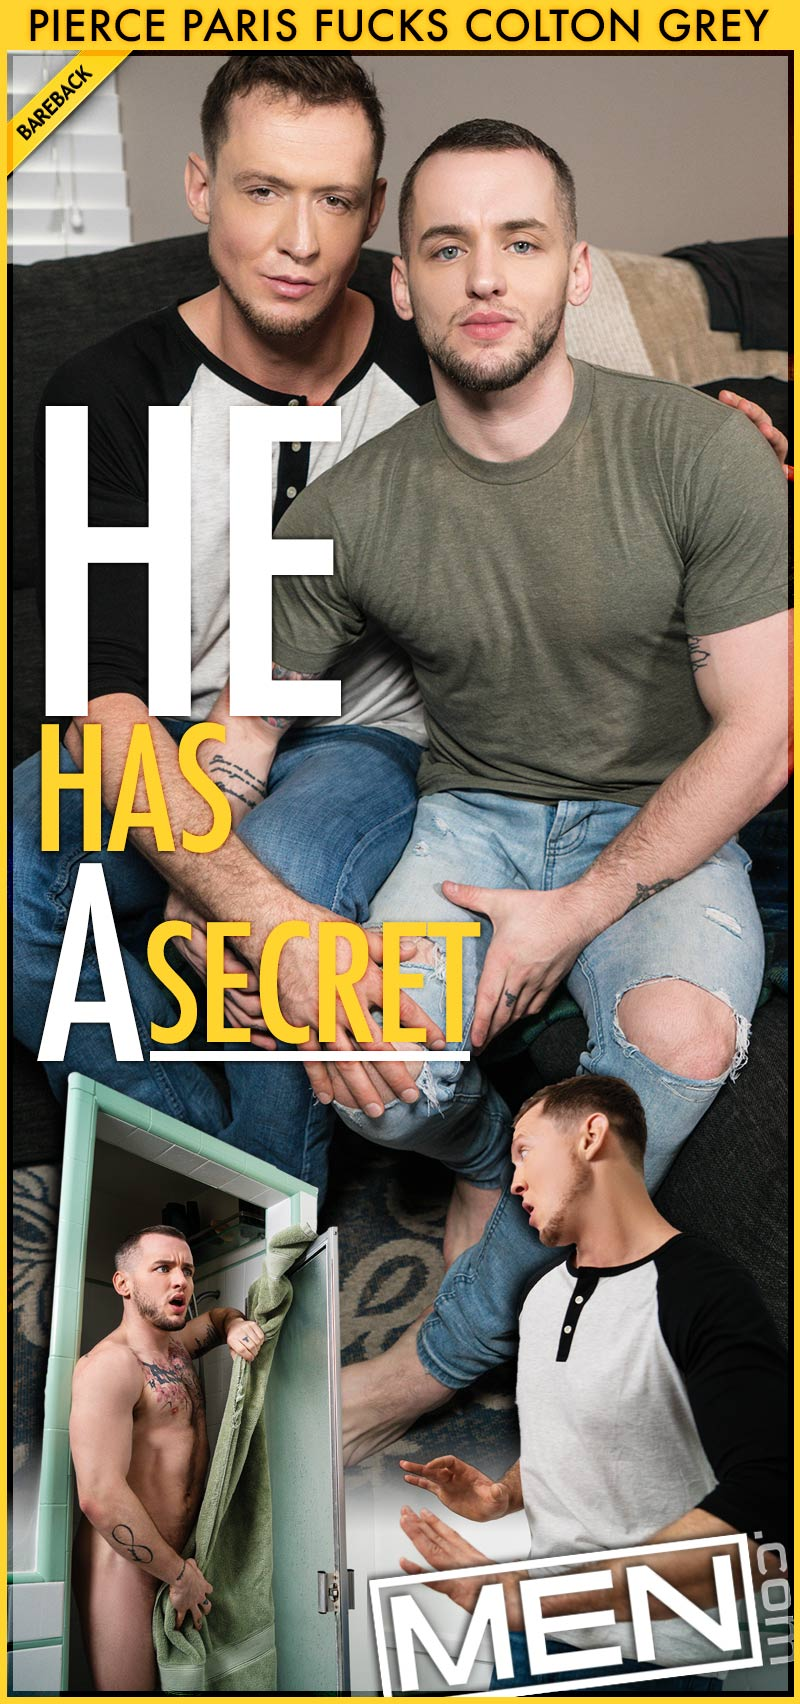 He Has A Secret: Bareback (Pierce Paris Fucks Colton Grey) at Str8 To Gay